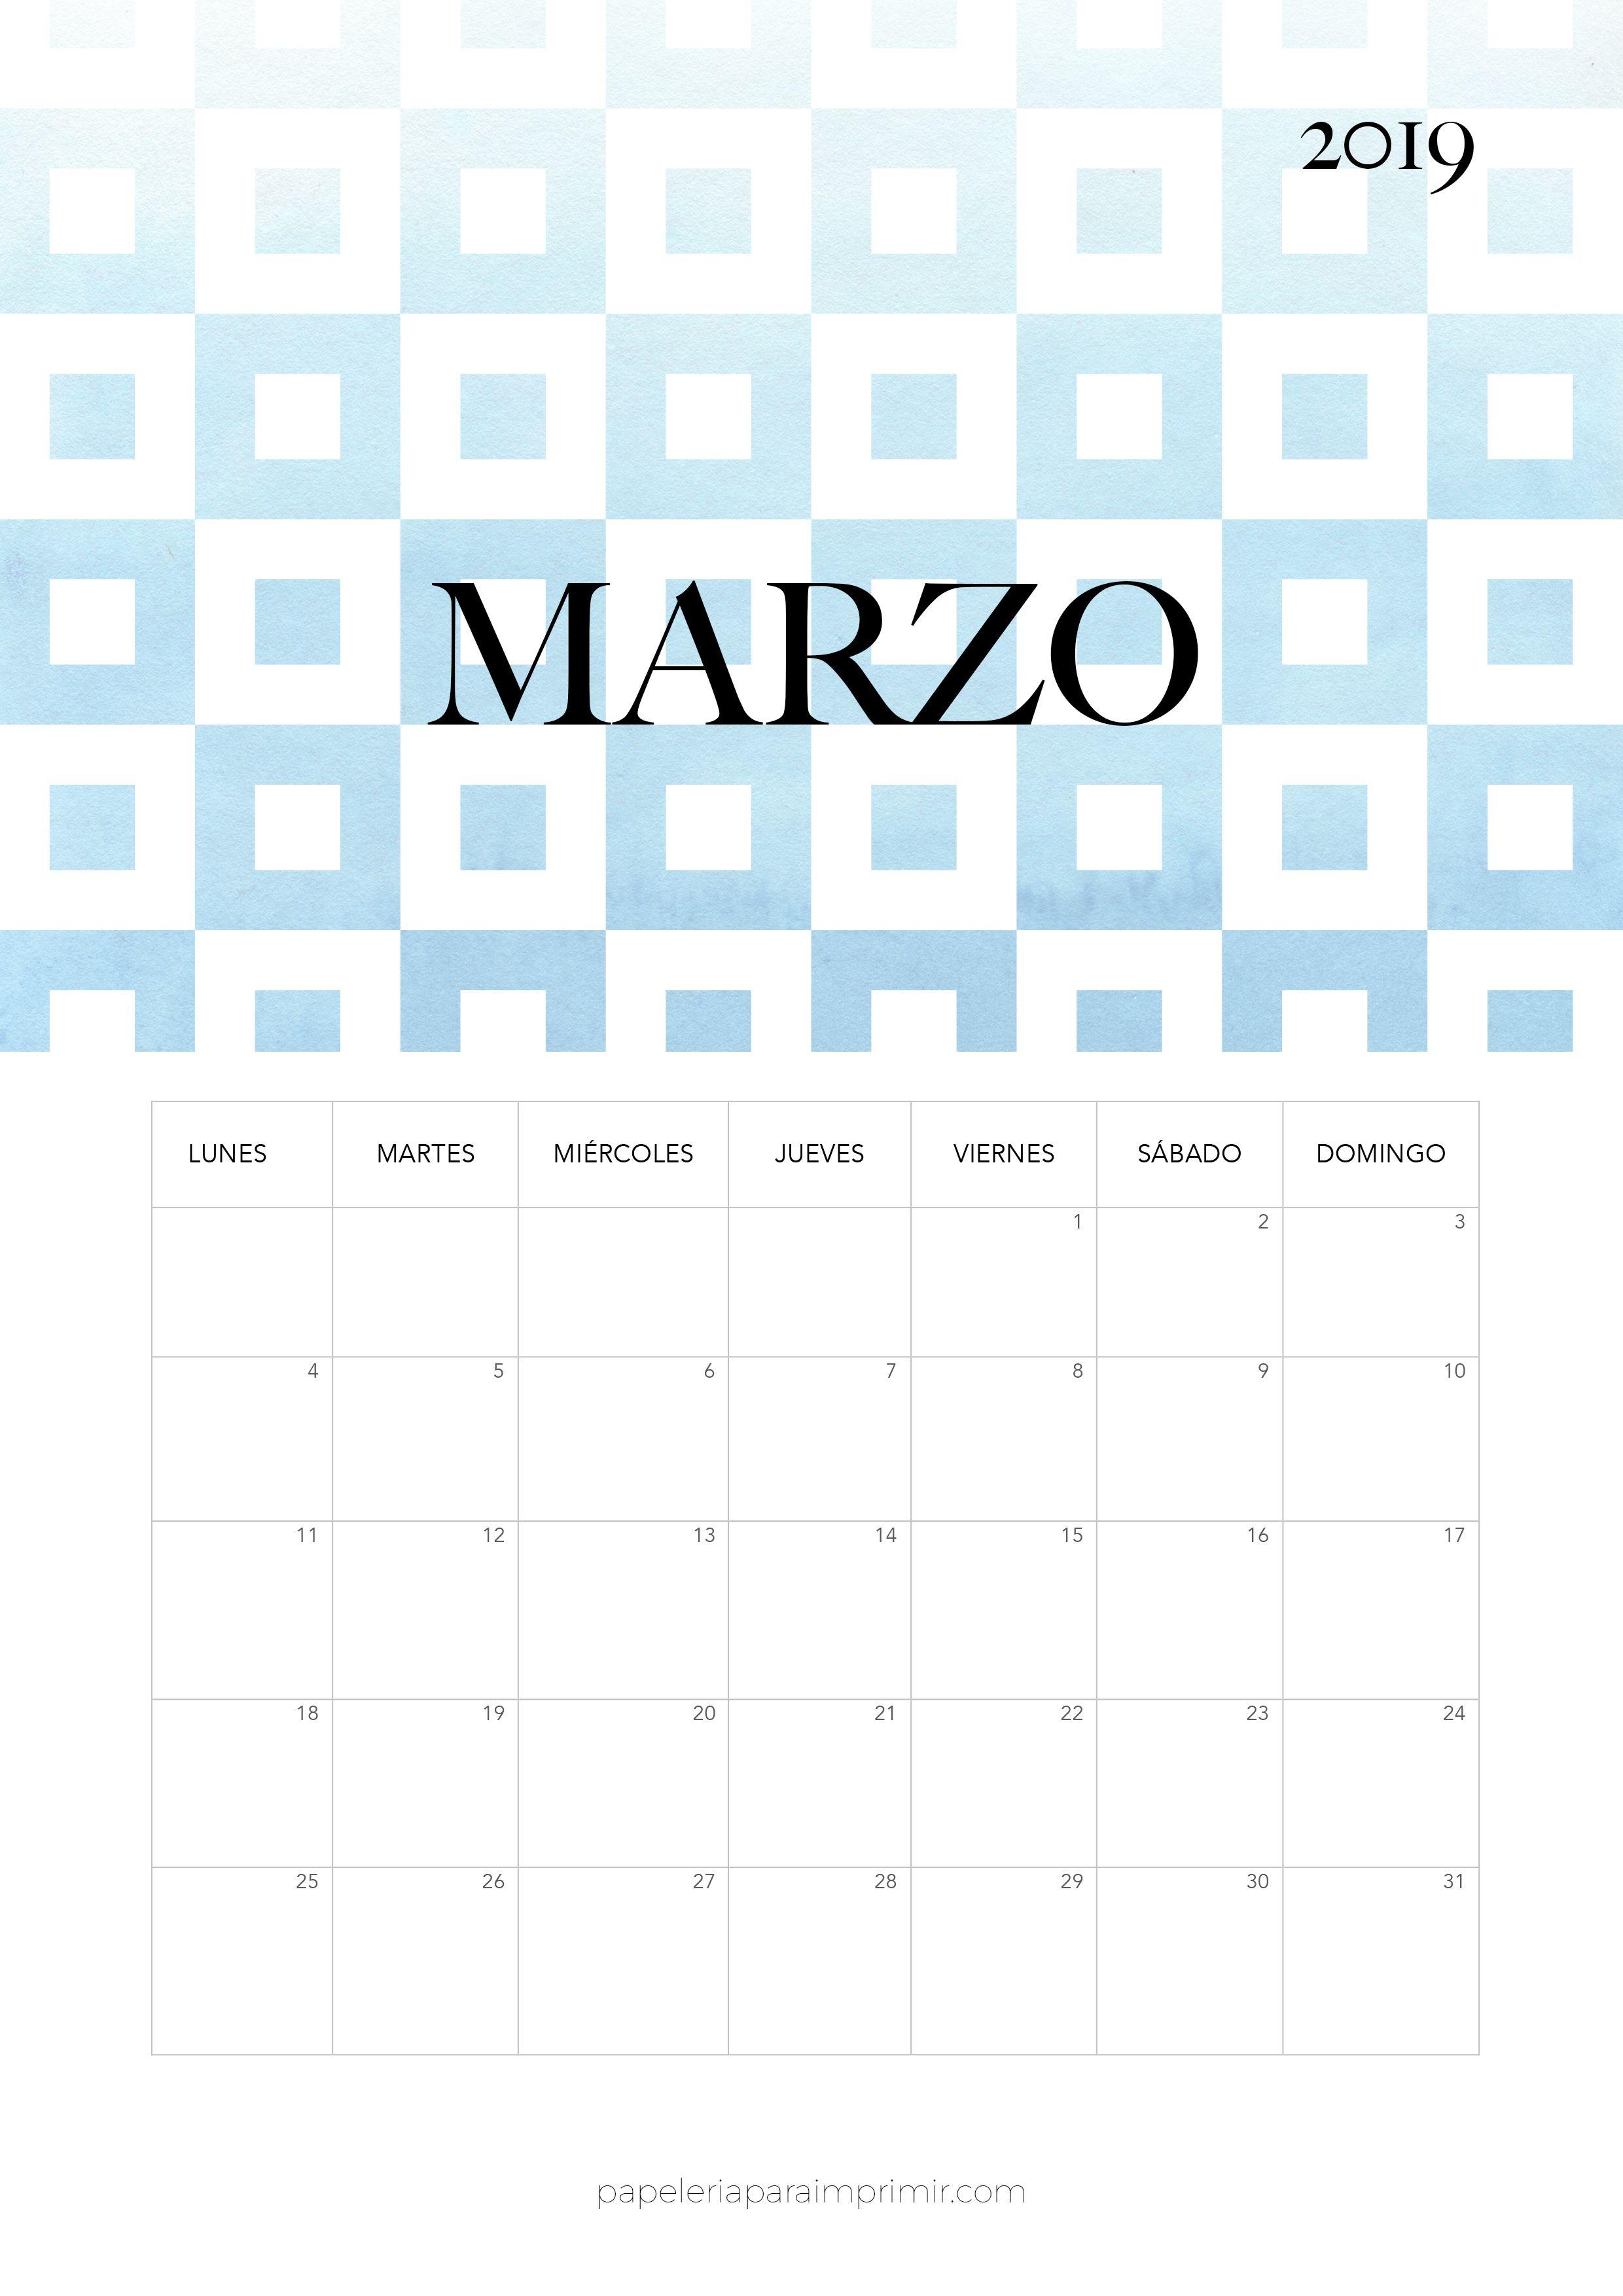 Calendario Mensual Imprimir.Calendario 2019 Marzo Calendario Mensual Moderno De Estilo Minimal